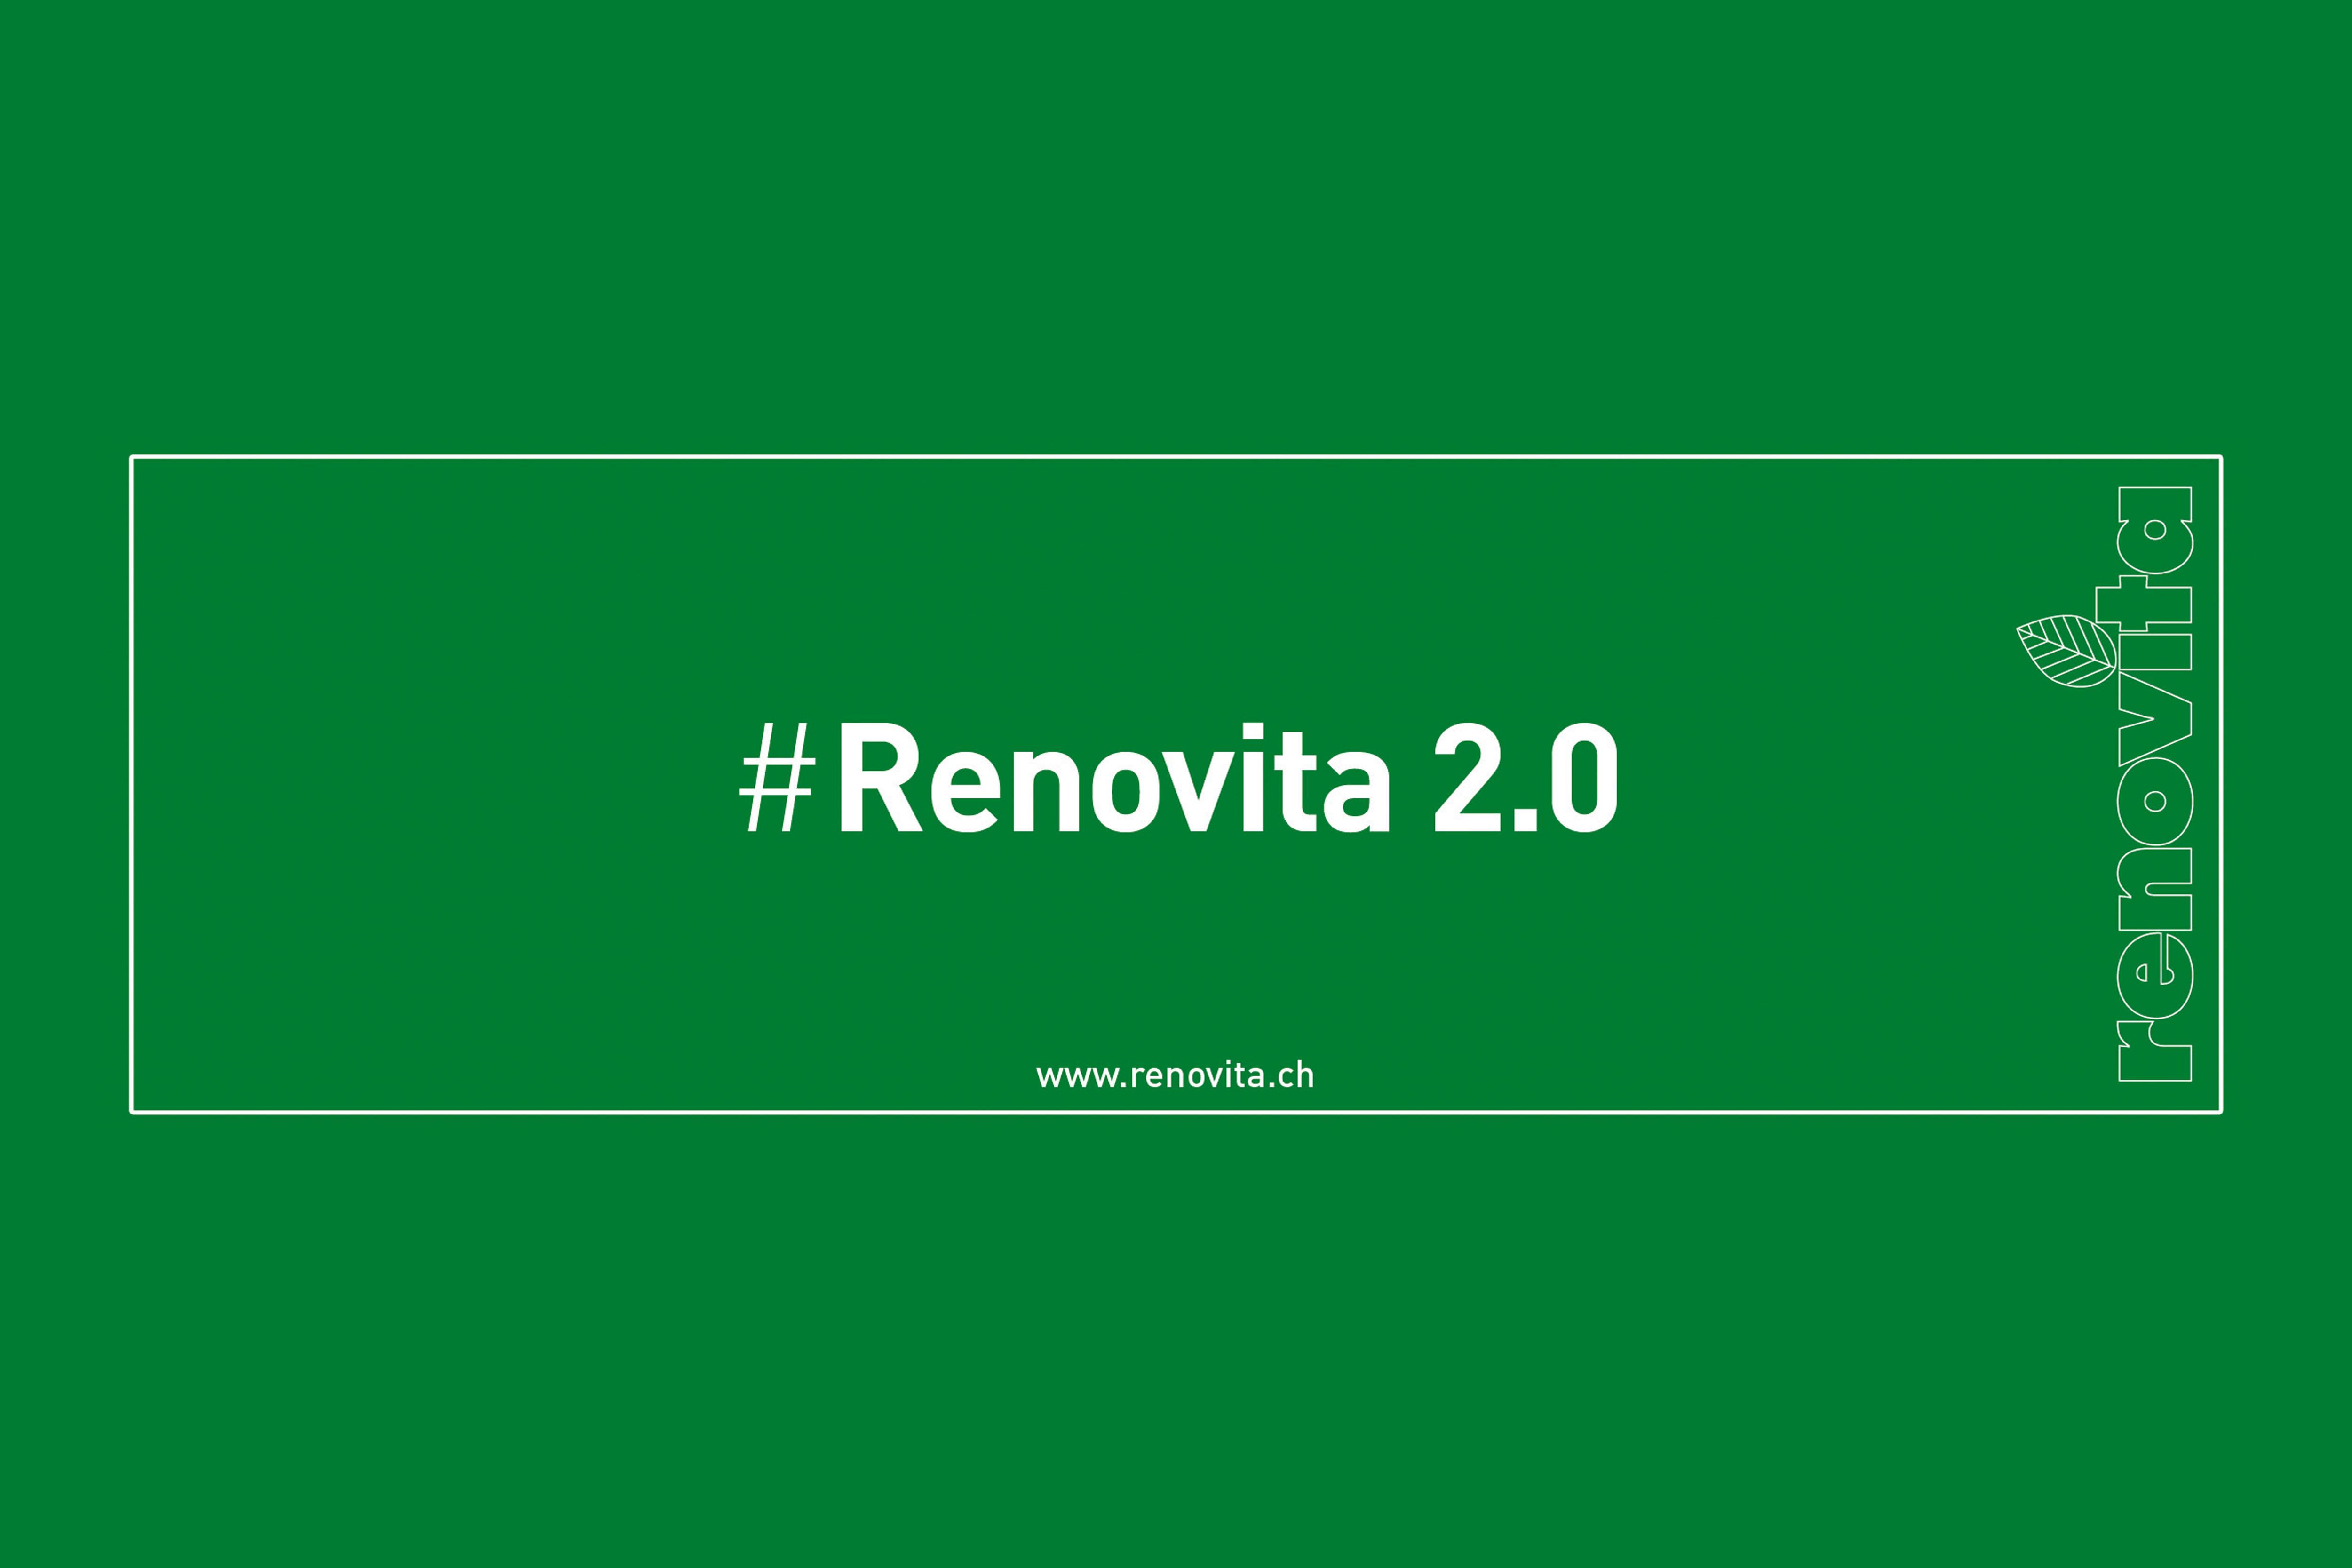 #Renovita_2.0